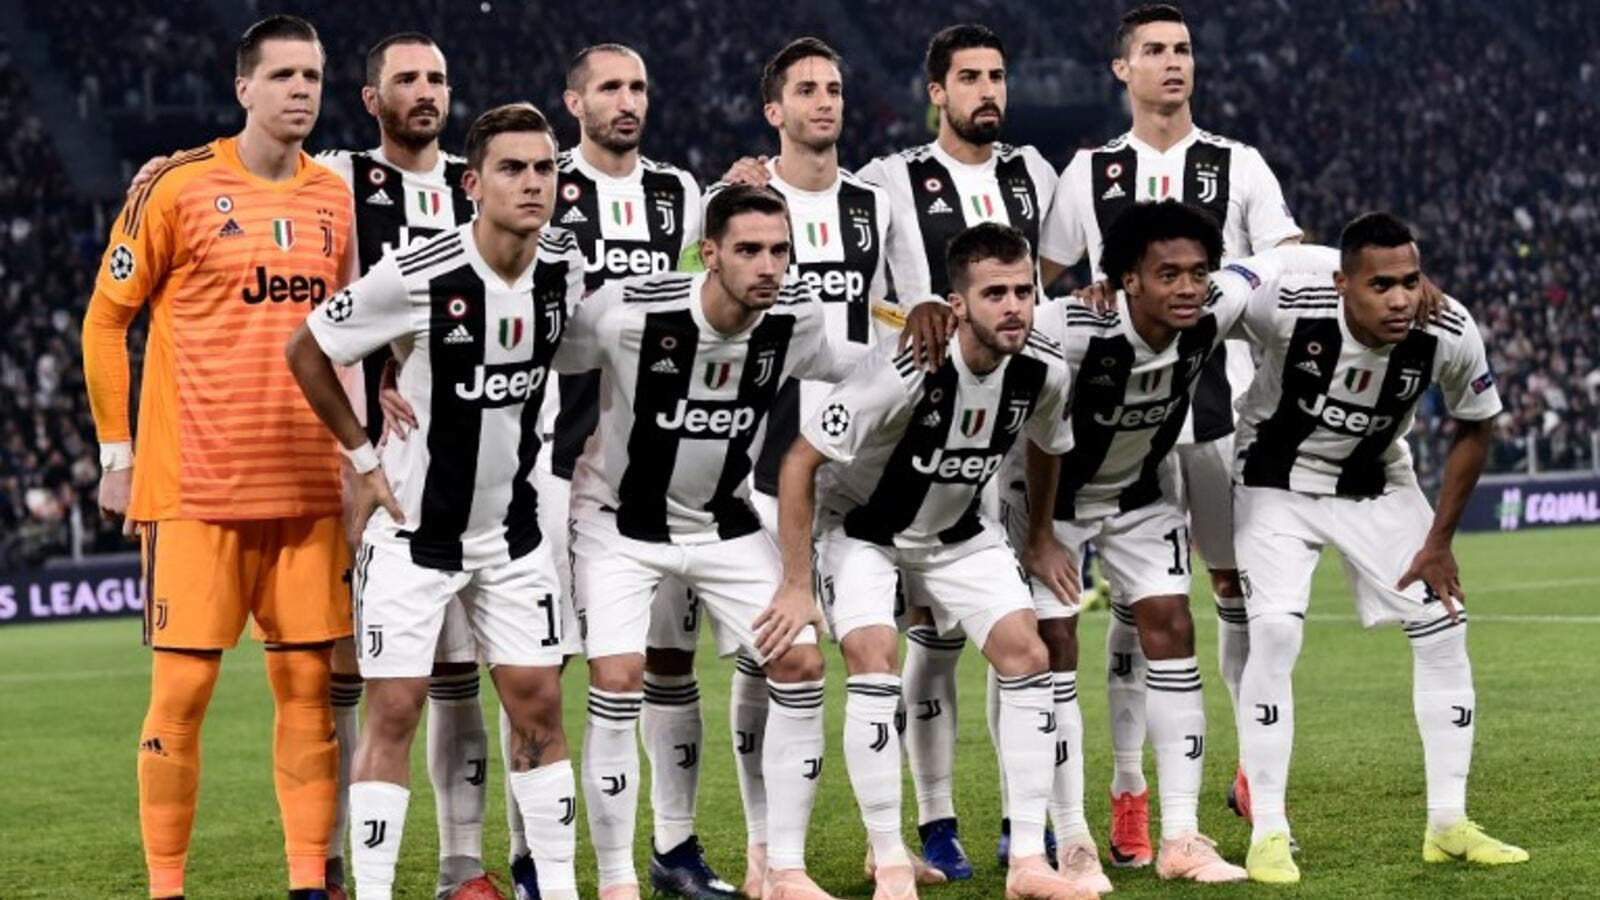 Juventus In Jeddah For Italian Super Cup Al Bawaba